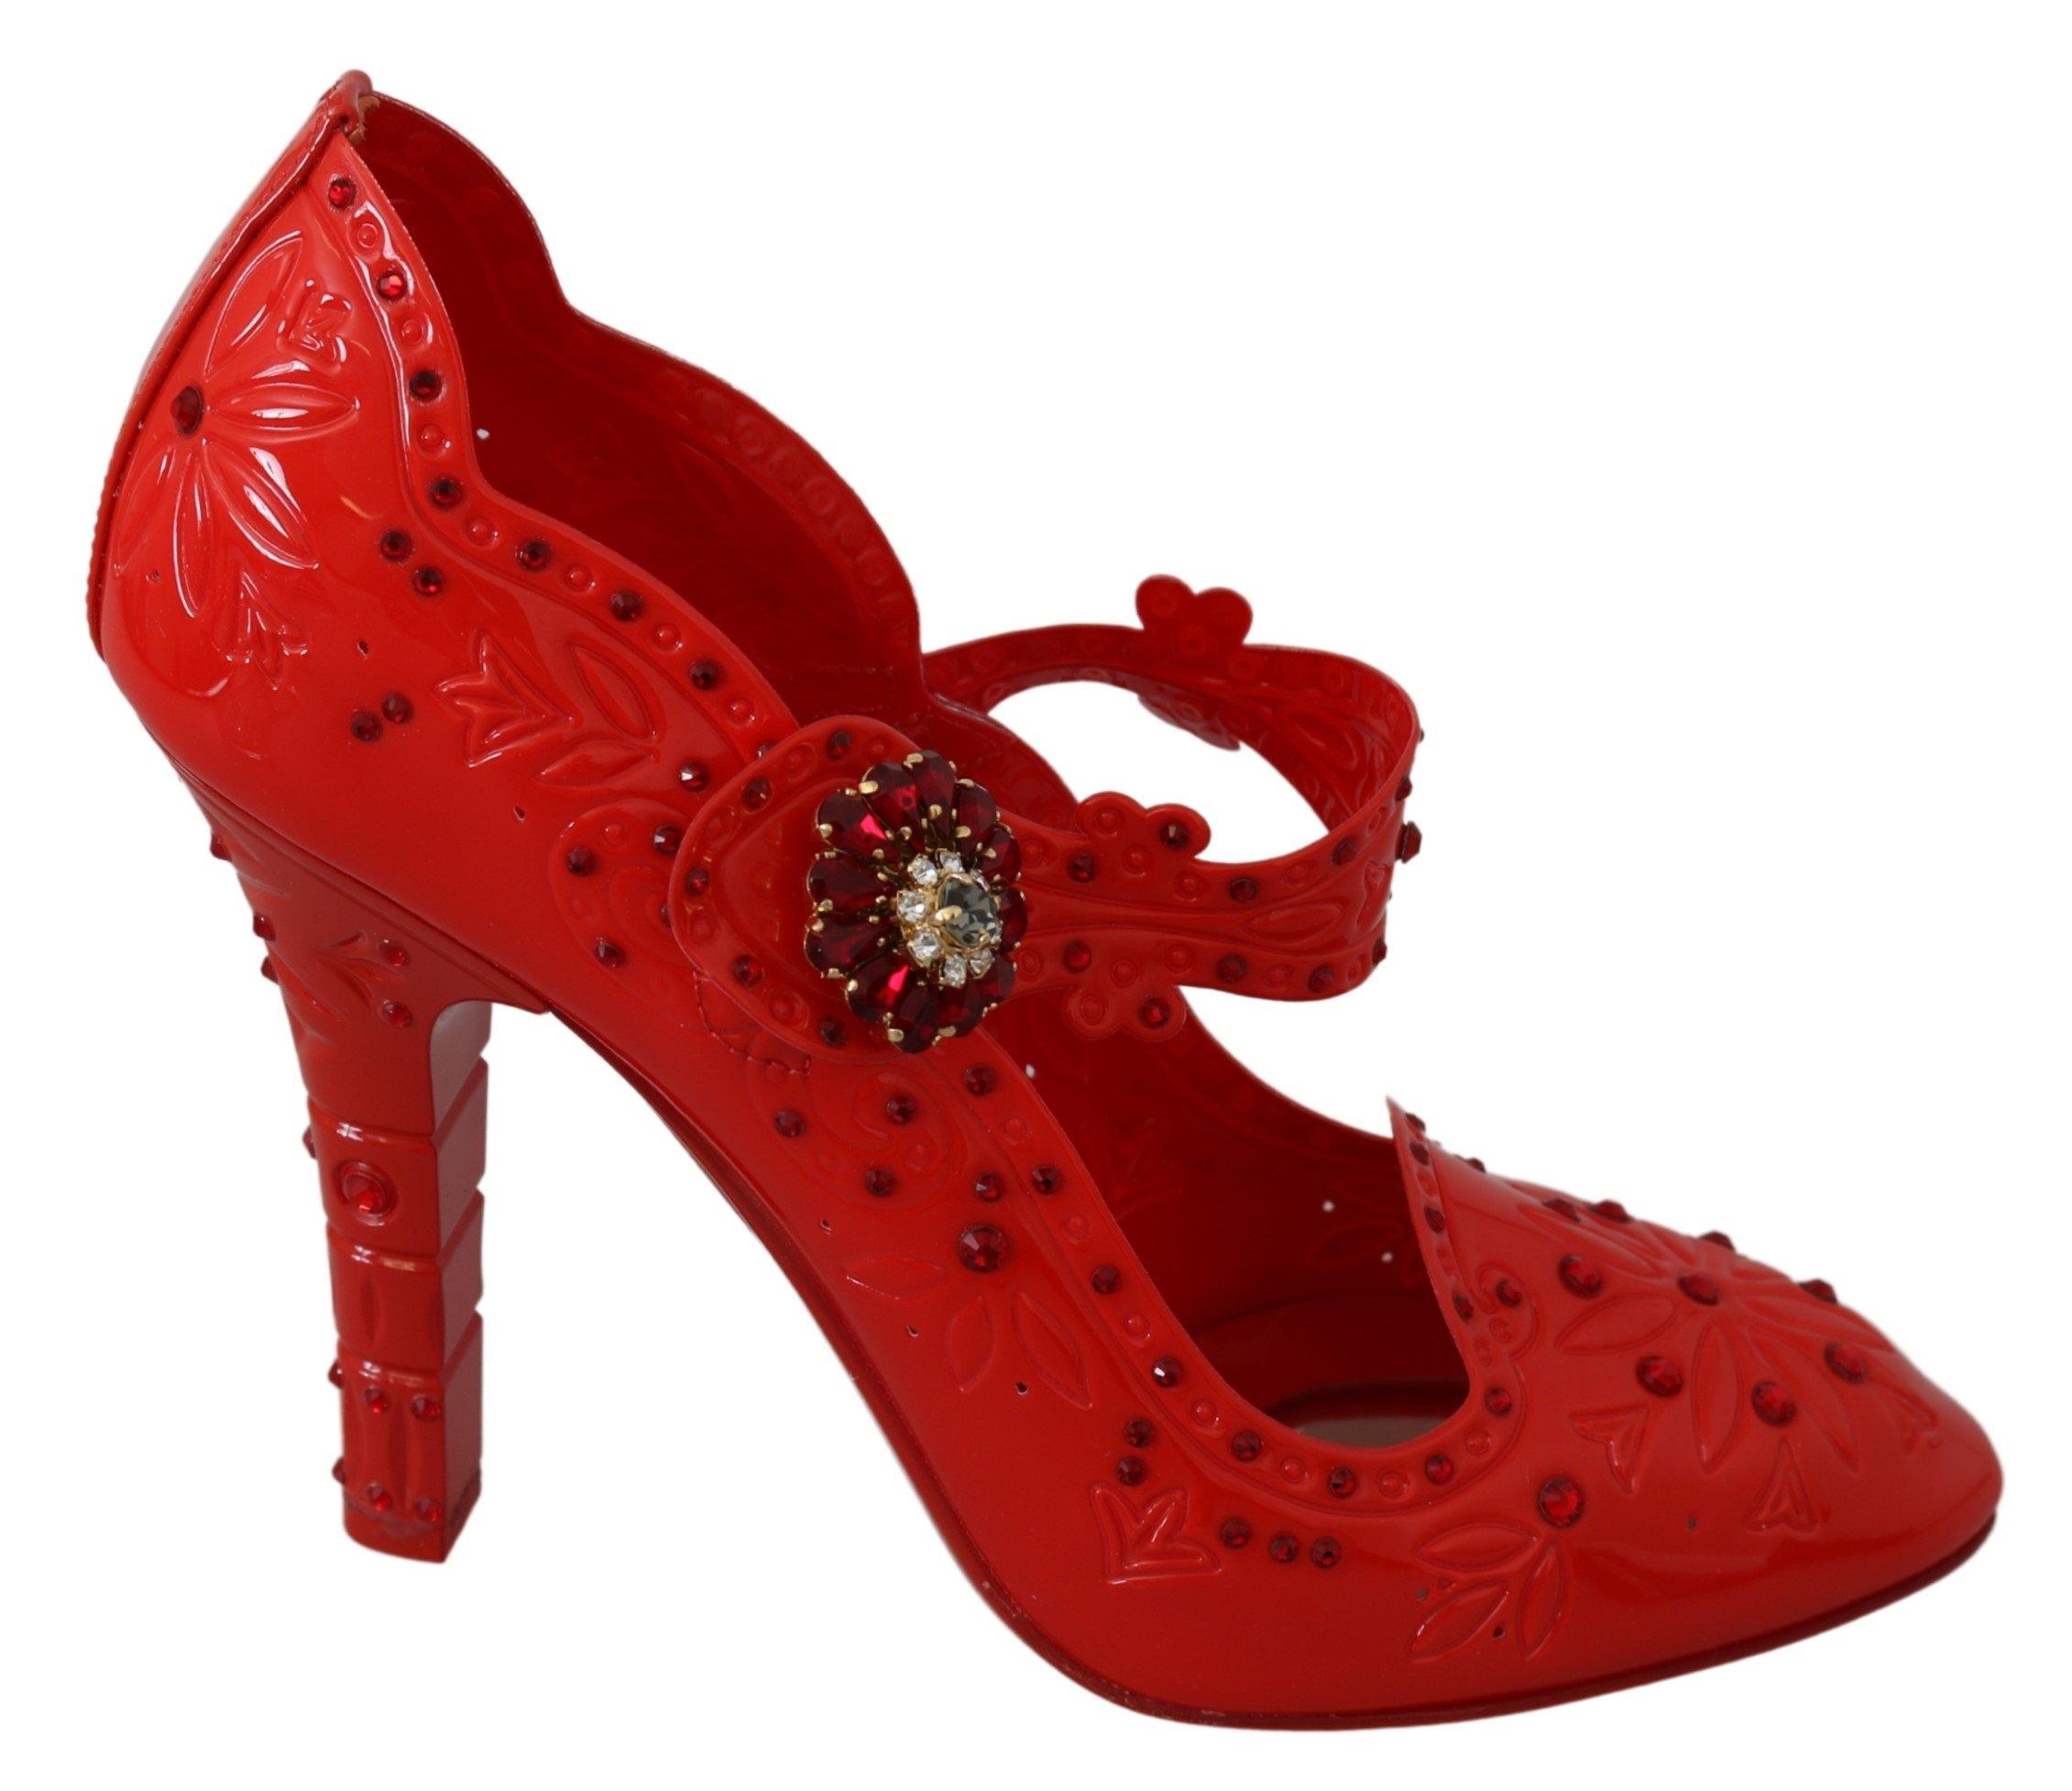 Dolce & Gabbana Women's Floral Crystal CINDERELLA Pumps Red LA7289 - EU40/US9.5